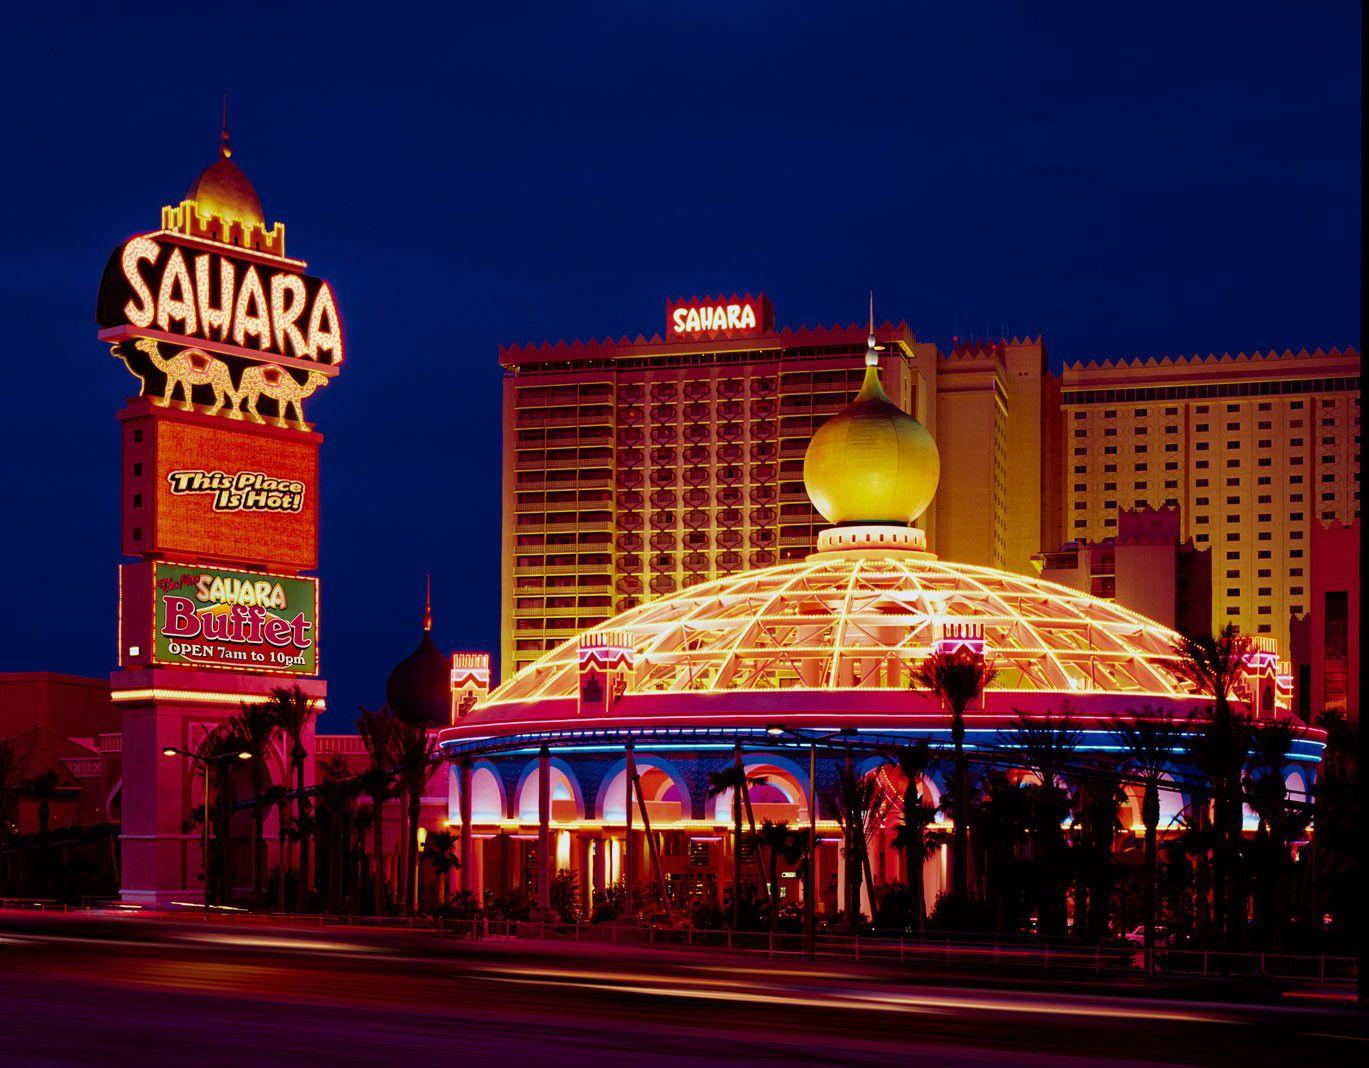 Las Vegas Nv Sahara Hotel Las Vegas Sls Las Vegas Las Vegas Hotels